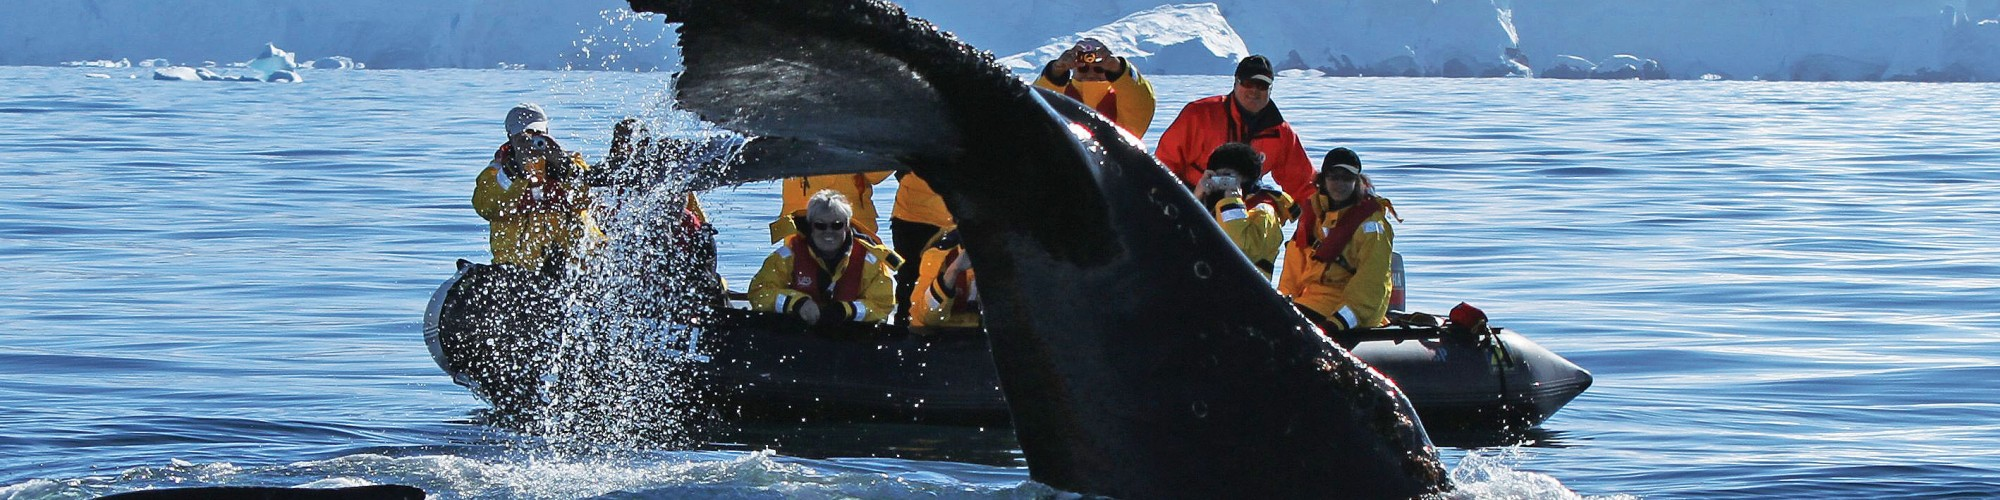 Antarctica - Gen - Hebridean Sky - Whale watching from zodiac